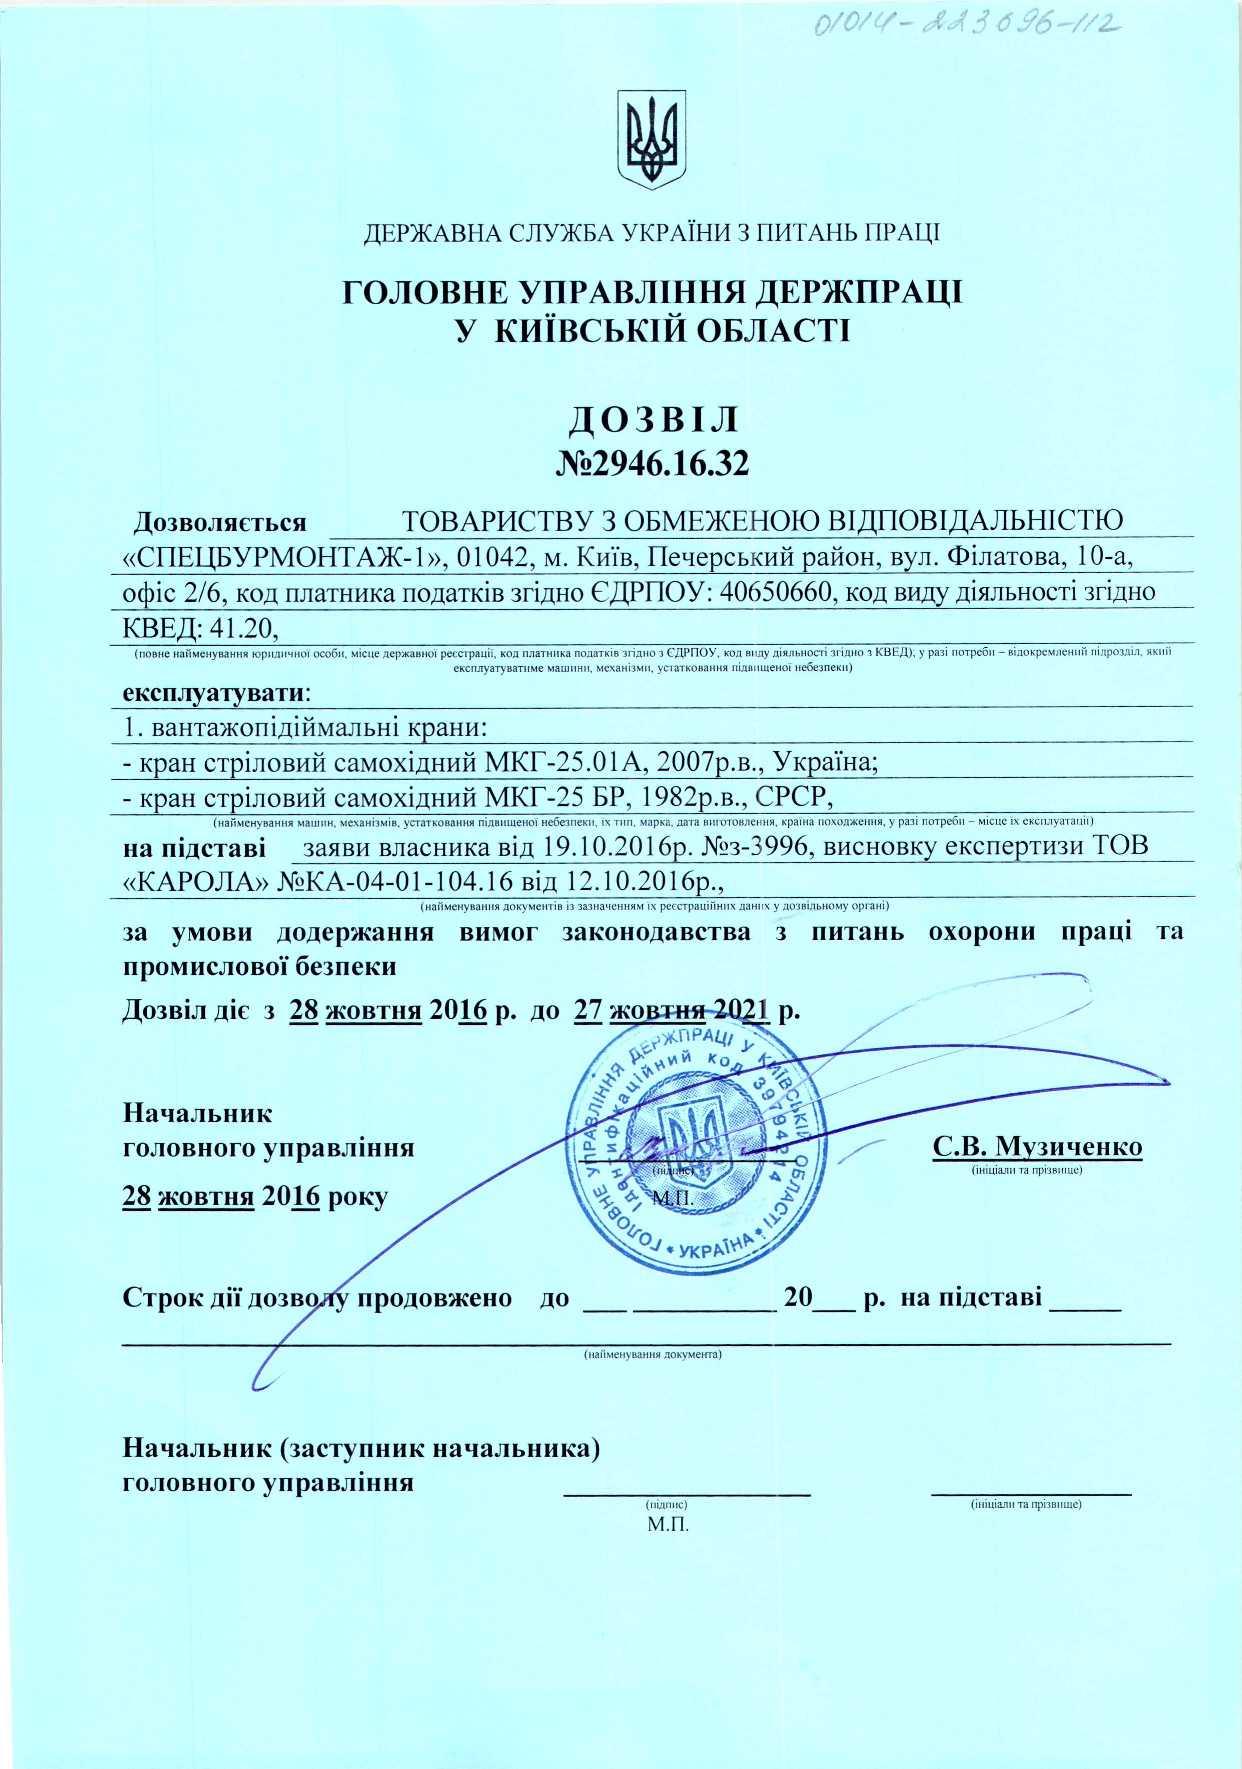 document_2016-11-04_0001-%d0%ba%d0%be%d0%bf%d0%b8%d1%8f